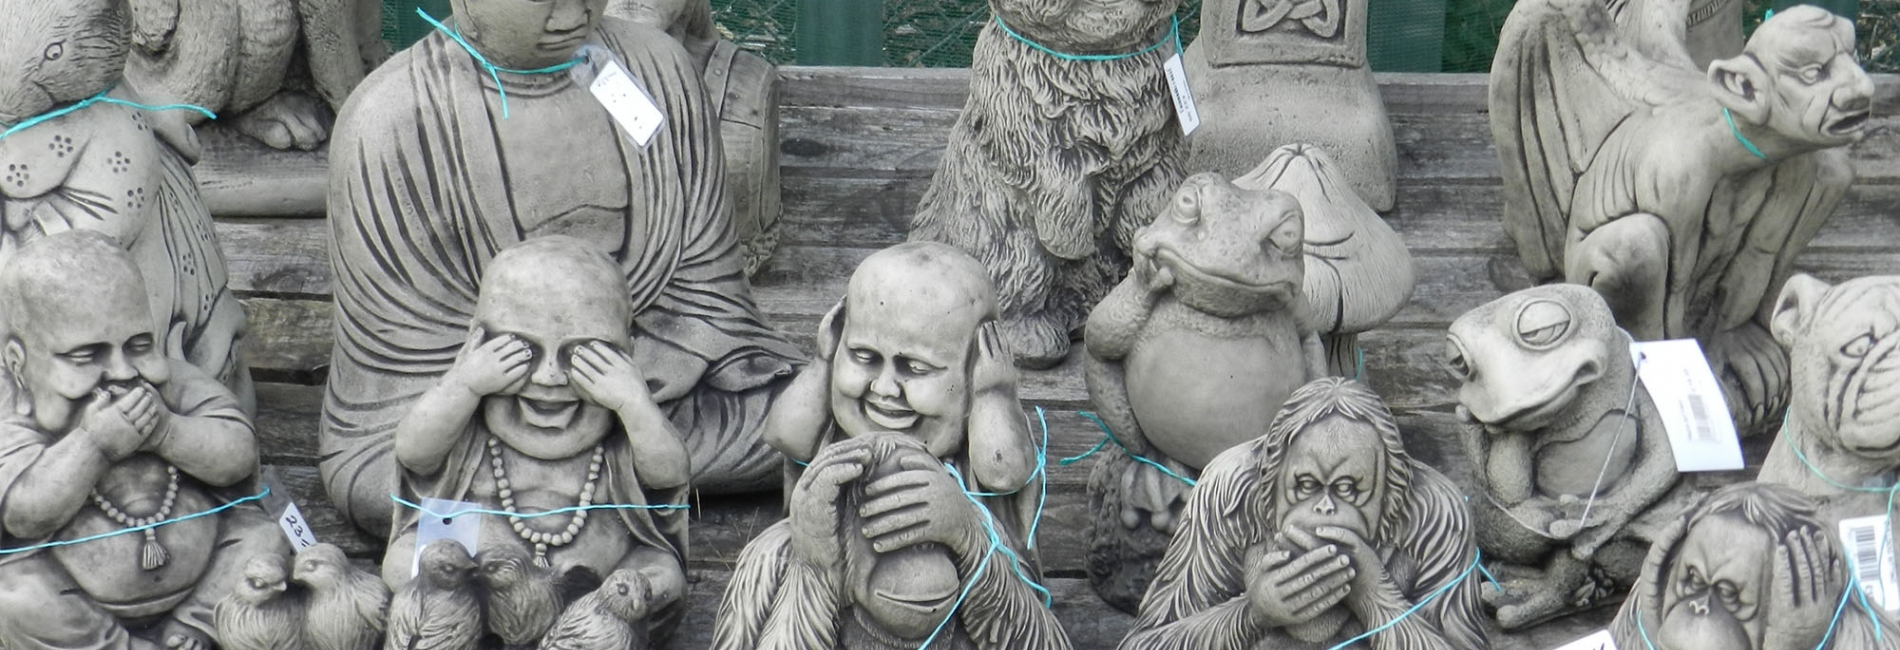 Pots & Statuary